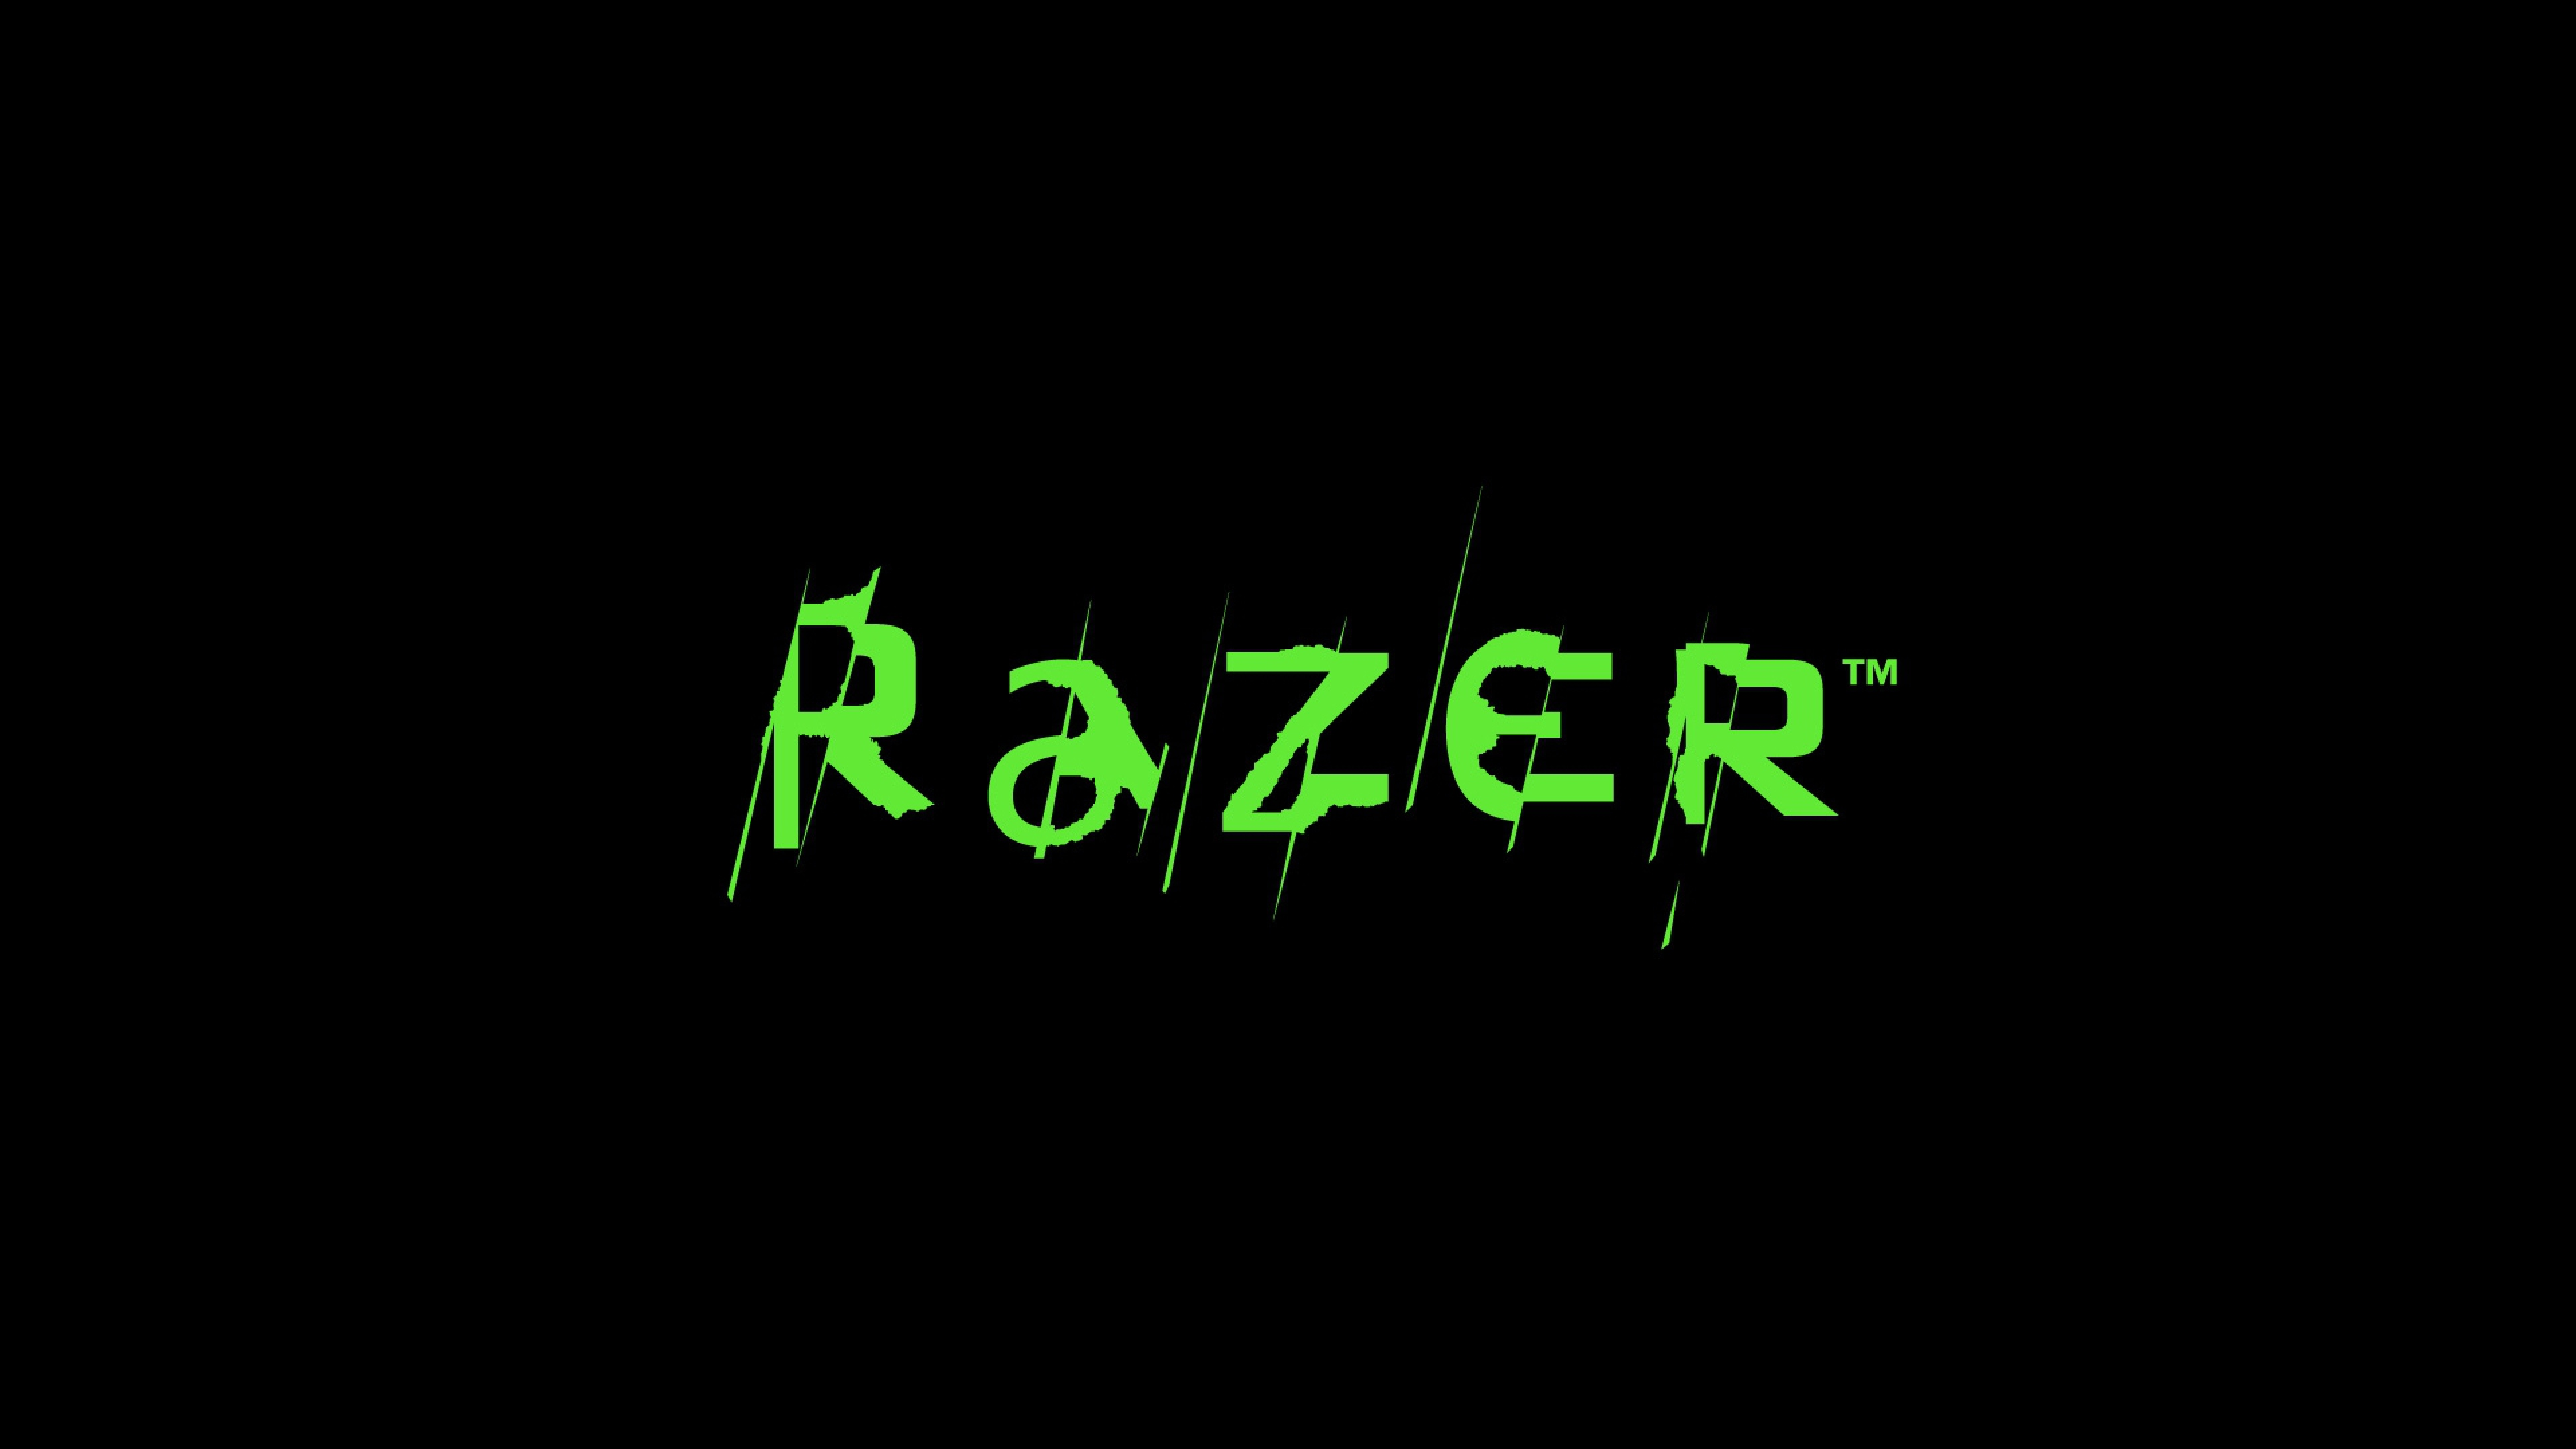 Download 3840x2160 Razer Logo Text Wallpaper Background 4K Ultra HD 3840x2160